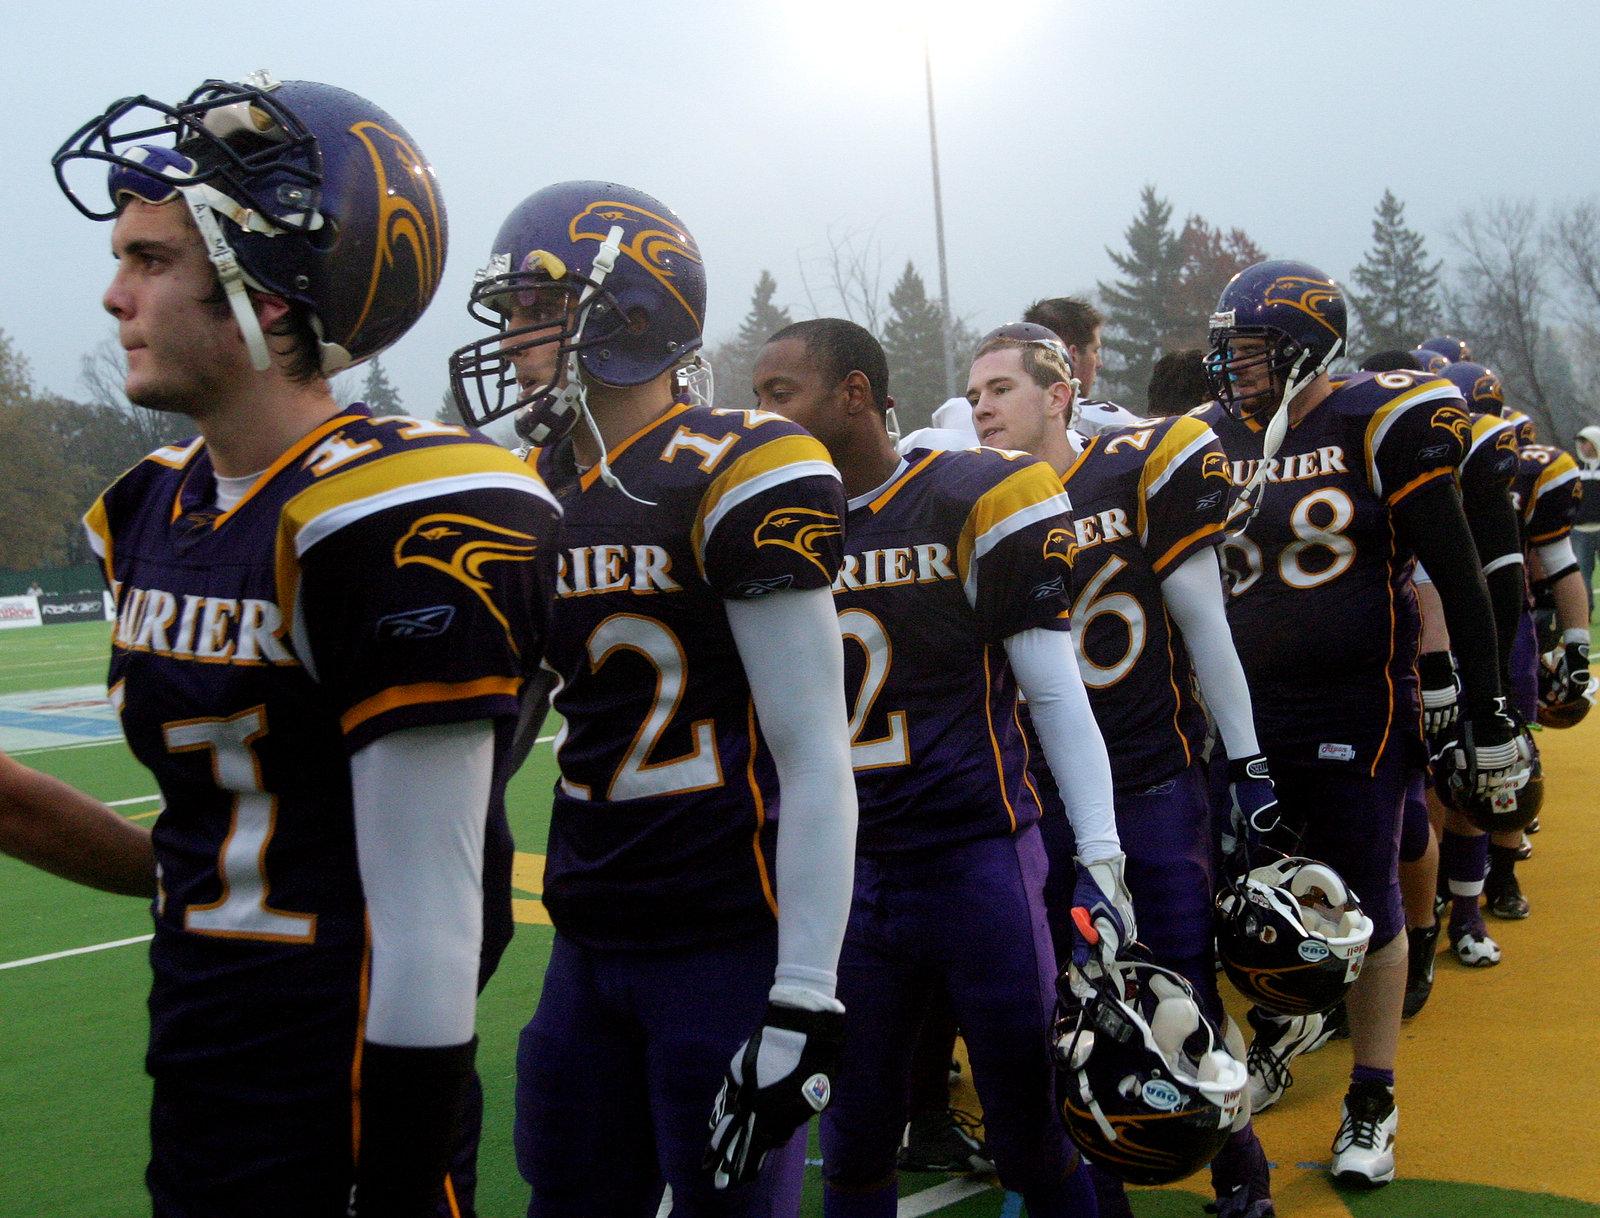 Wilfrid Laurier University football team at Ontario University Athletics (OUA) semi-final game, 2005